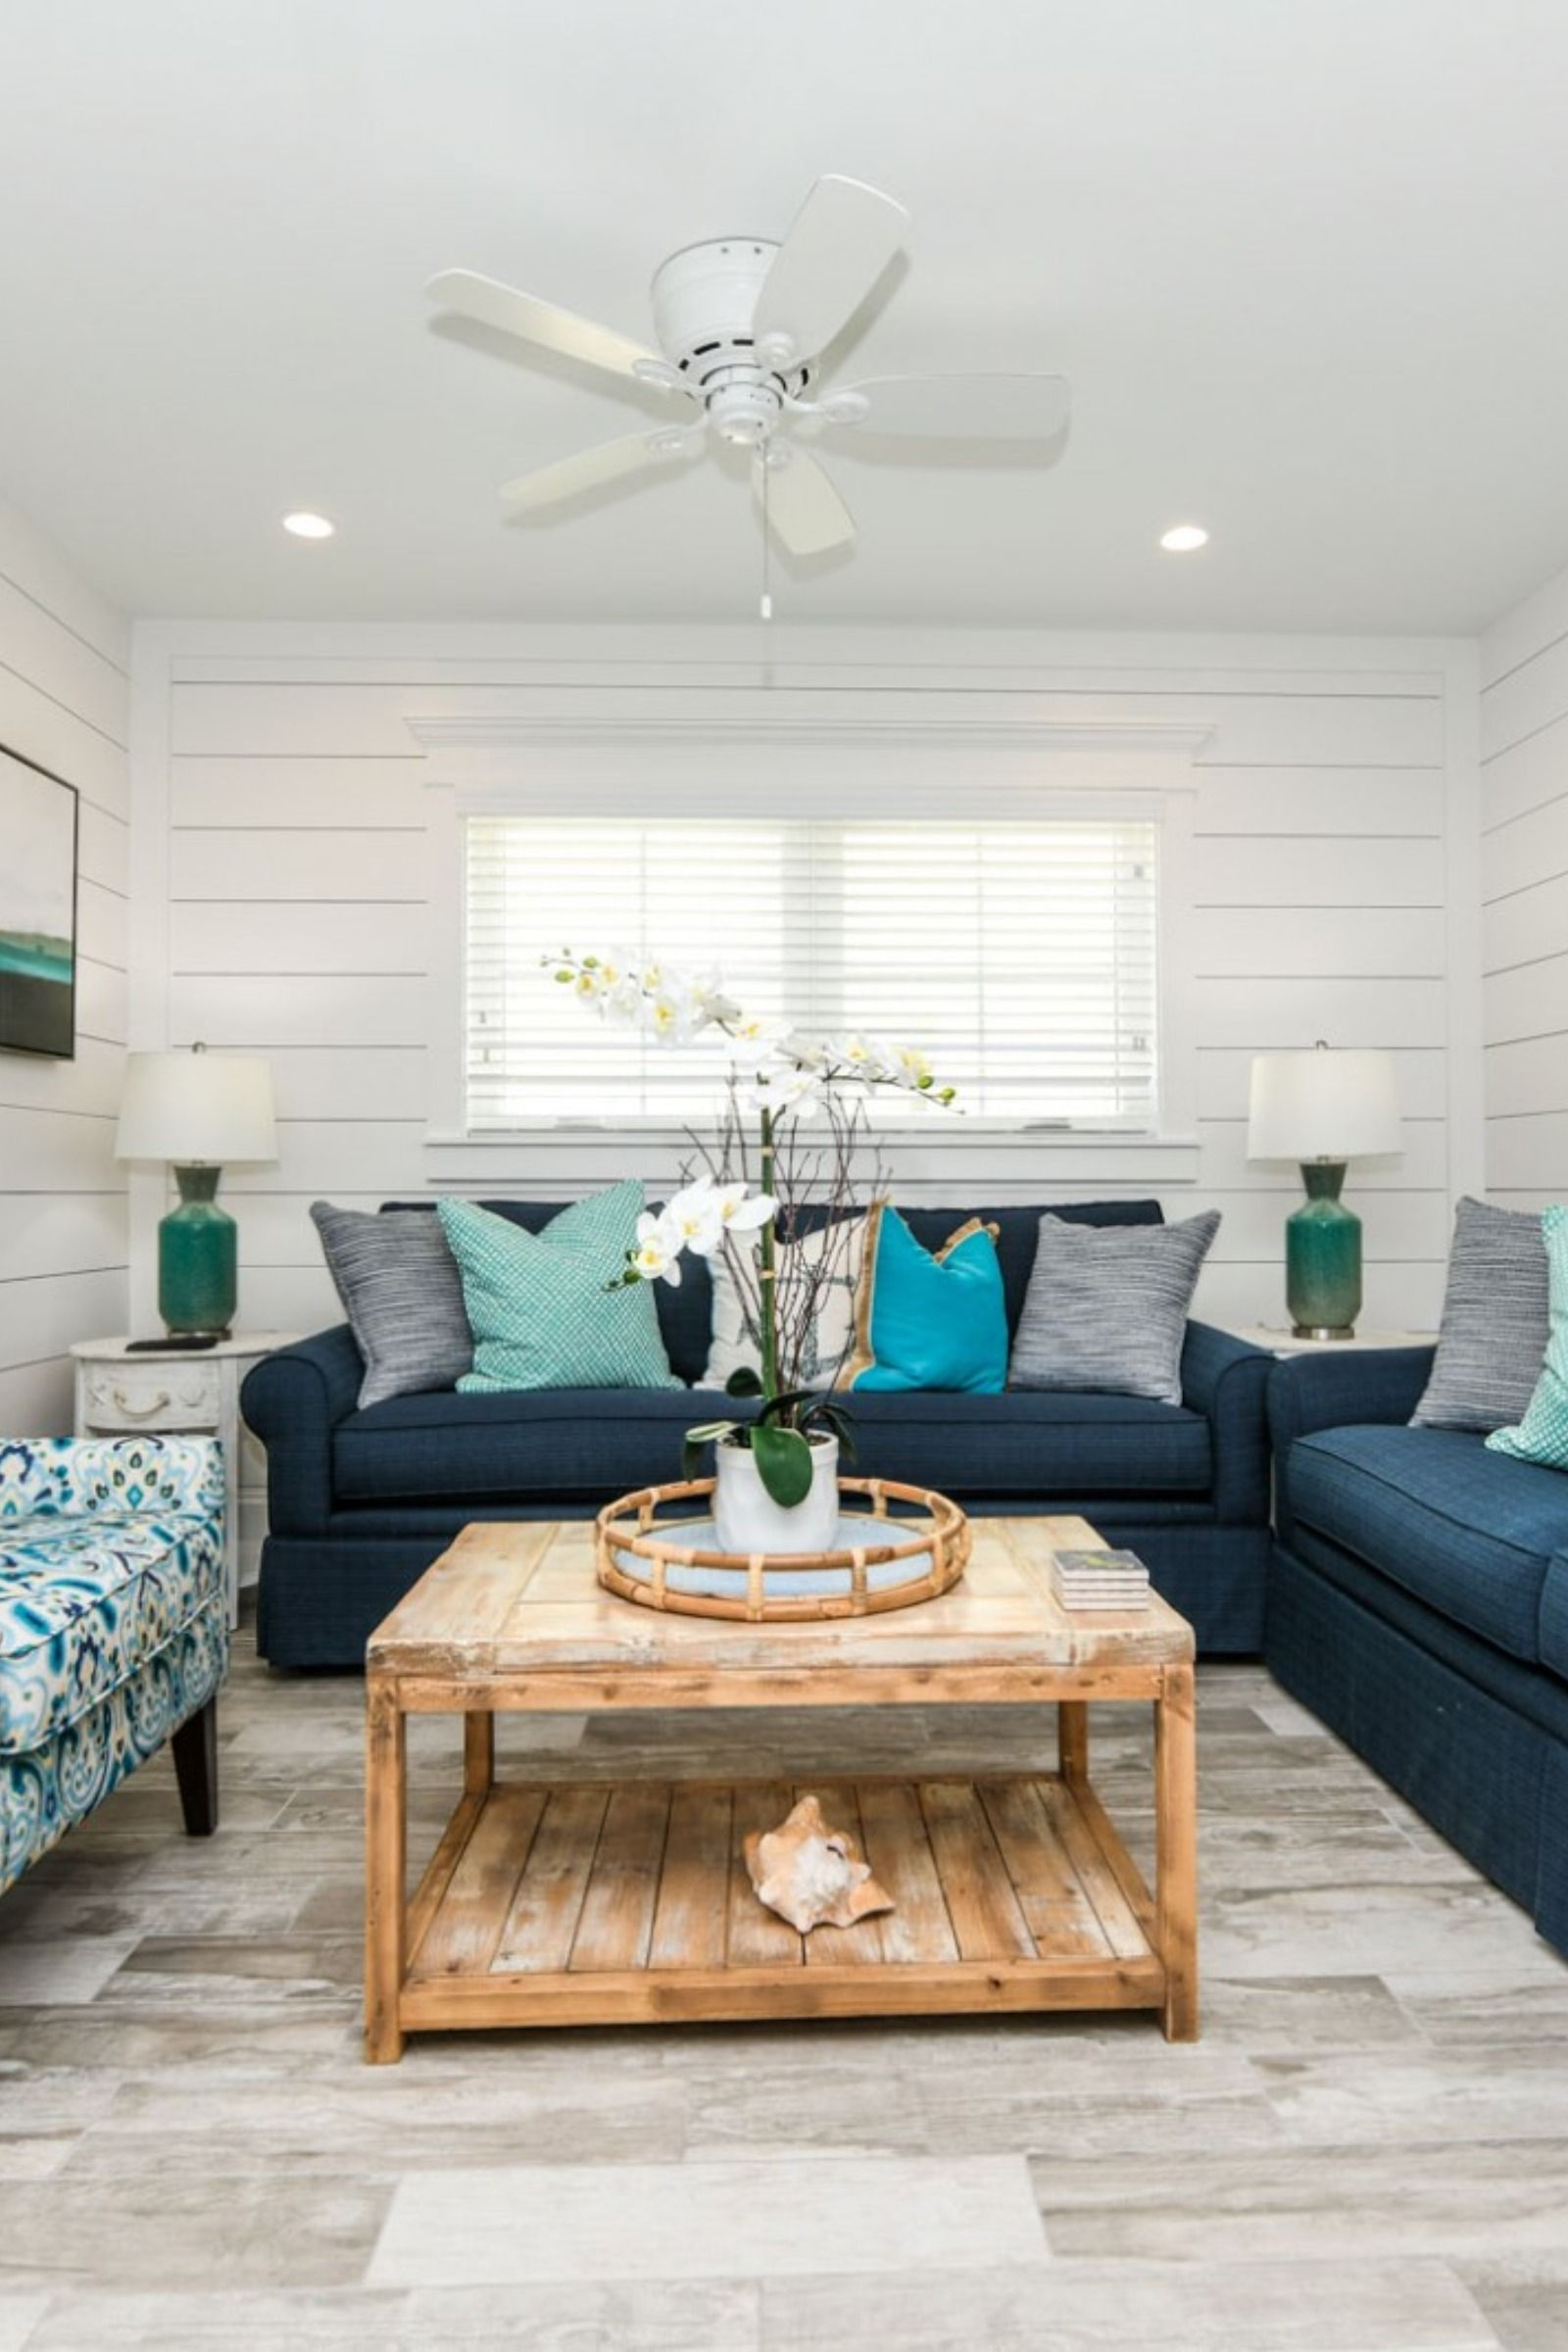 A Siesta Key Pet Friendly Vacation Luxury Beach House Luxury Rentals Siesta Key Rentals